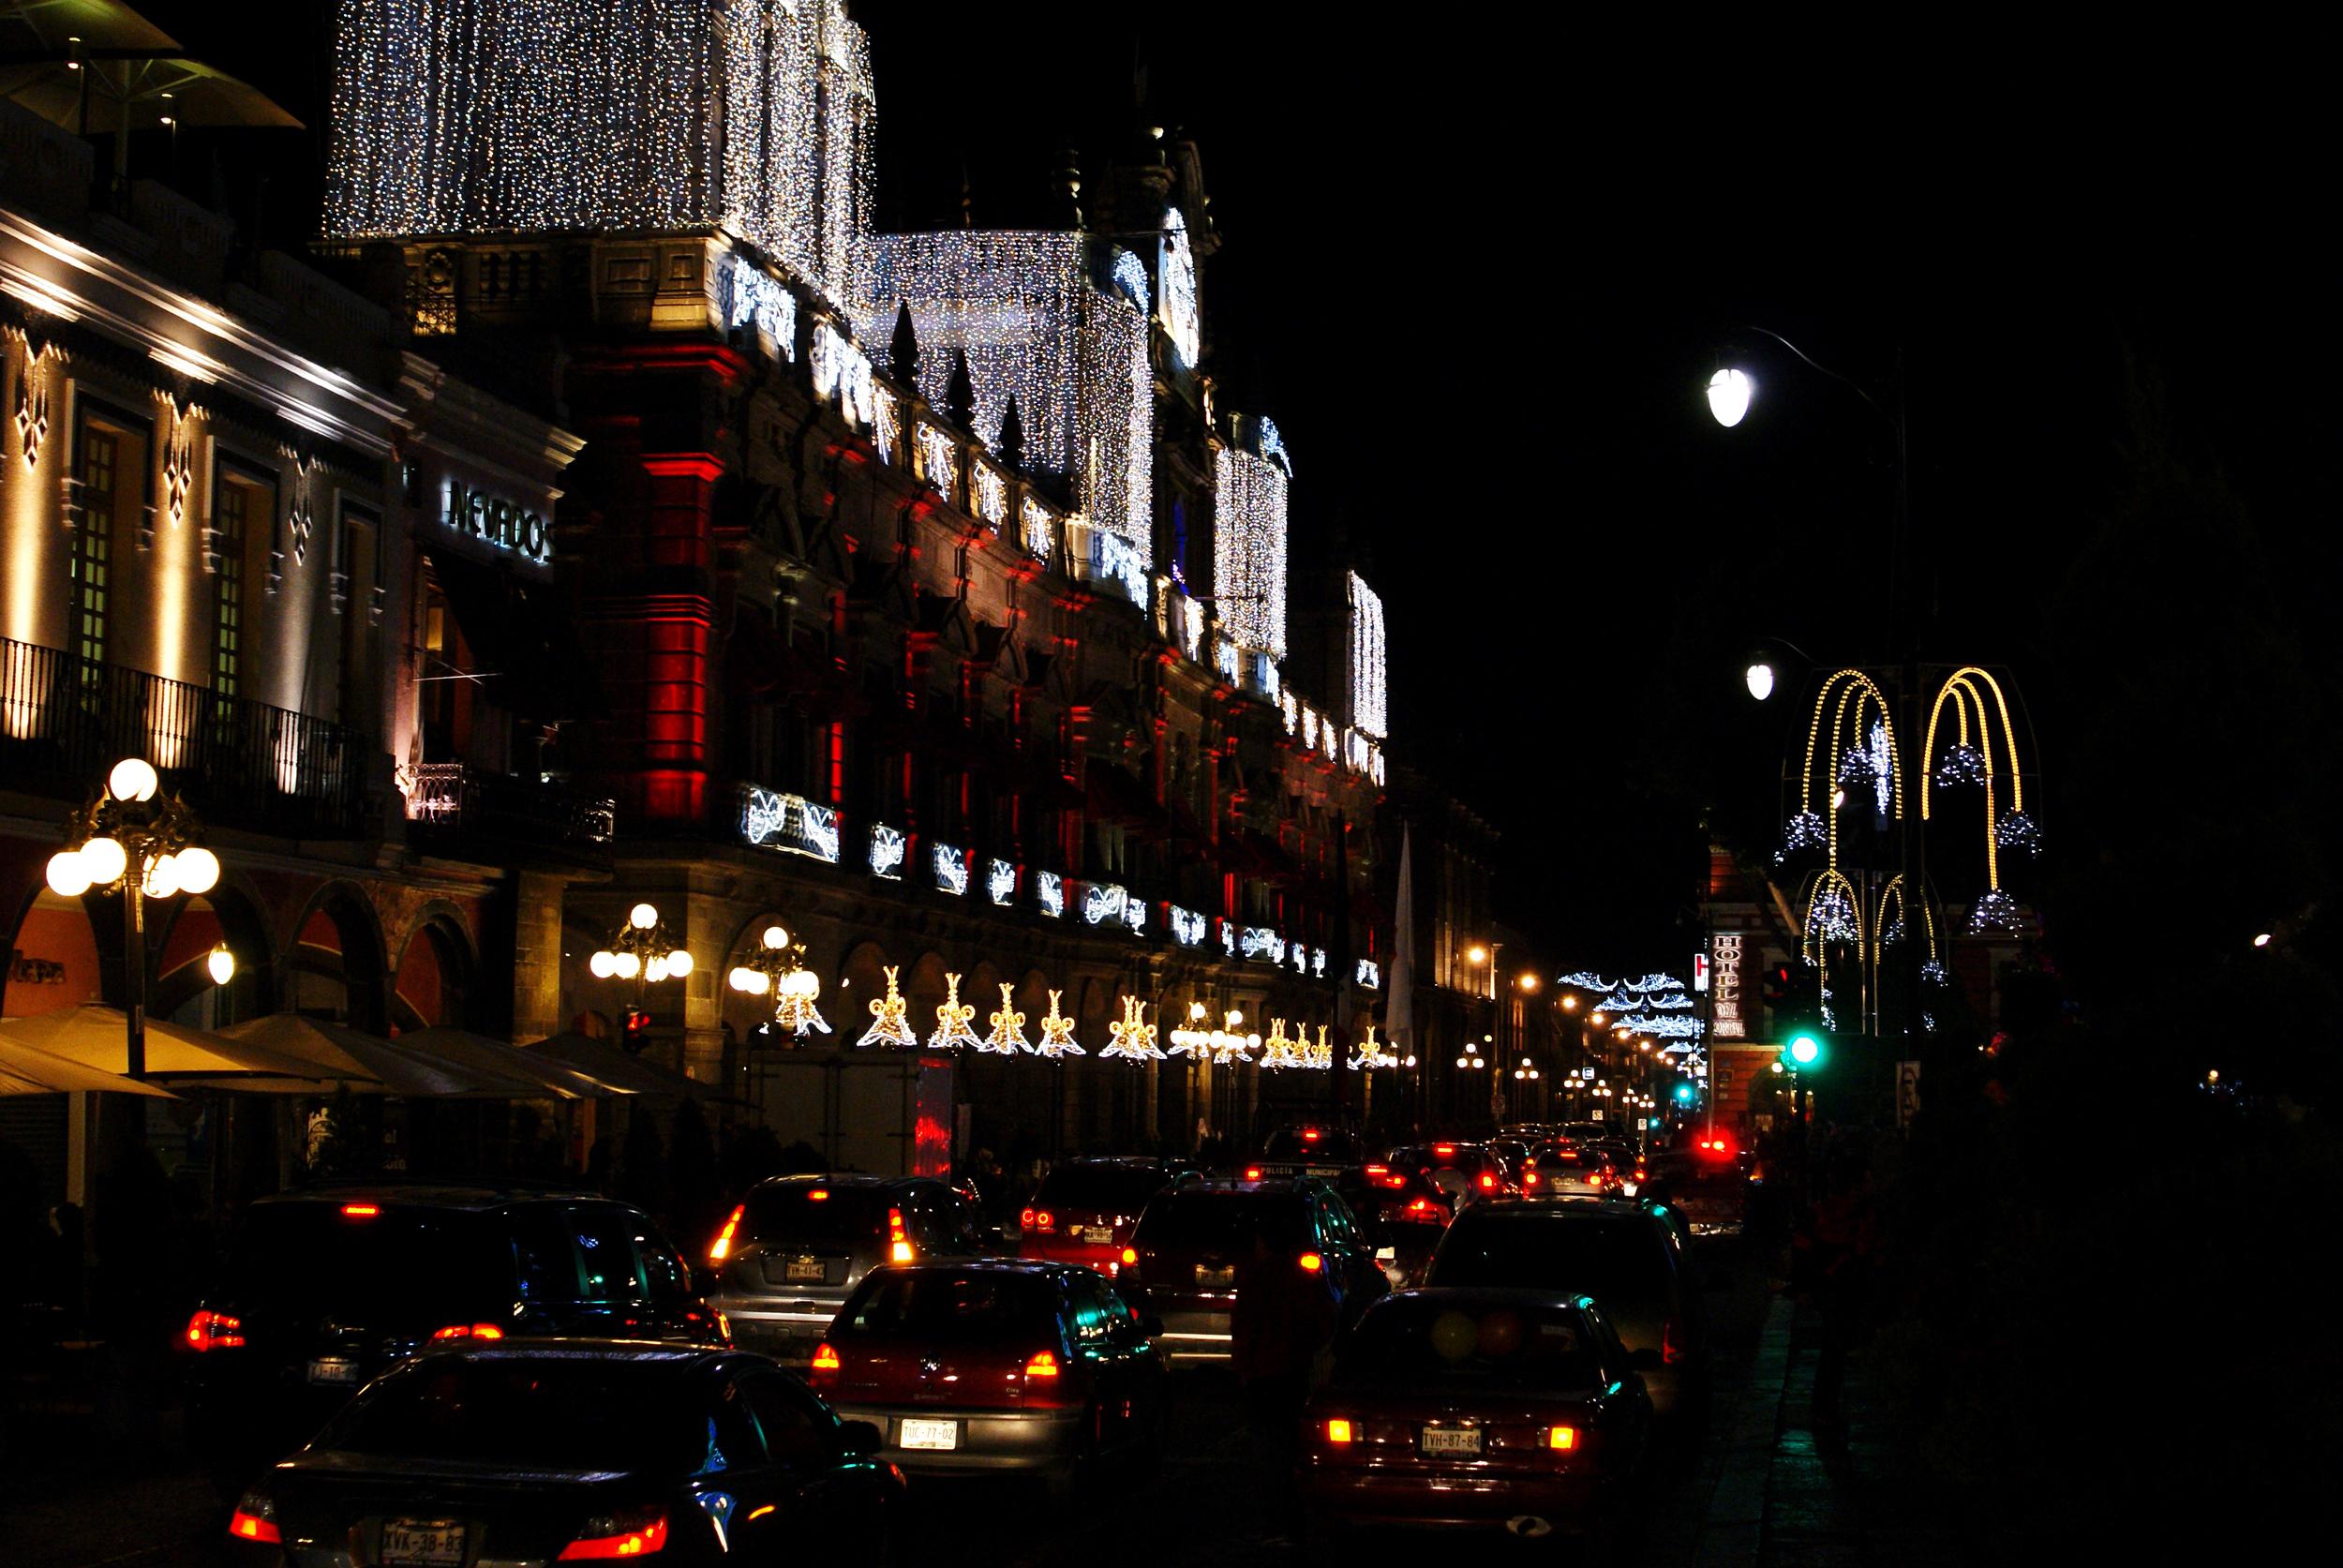 Traffic in Puebla